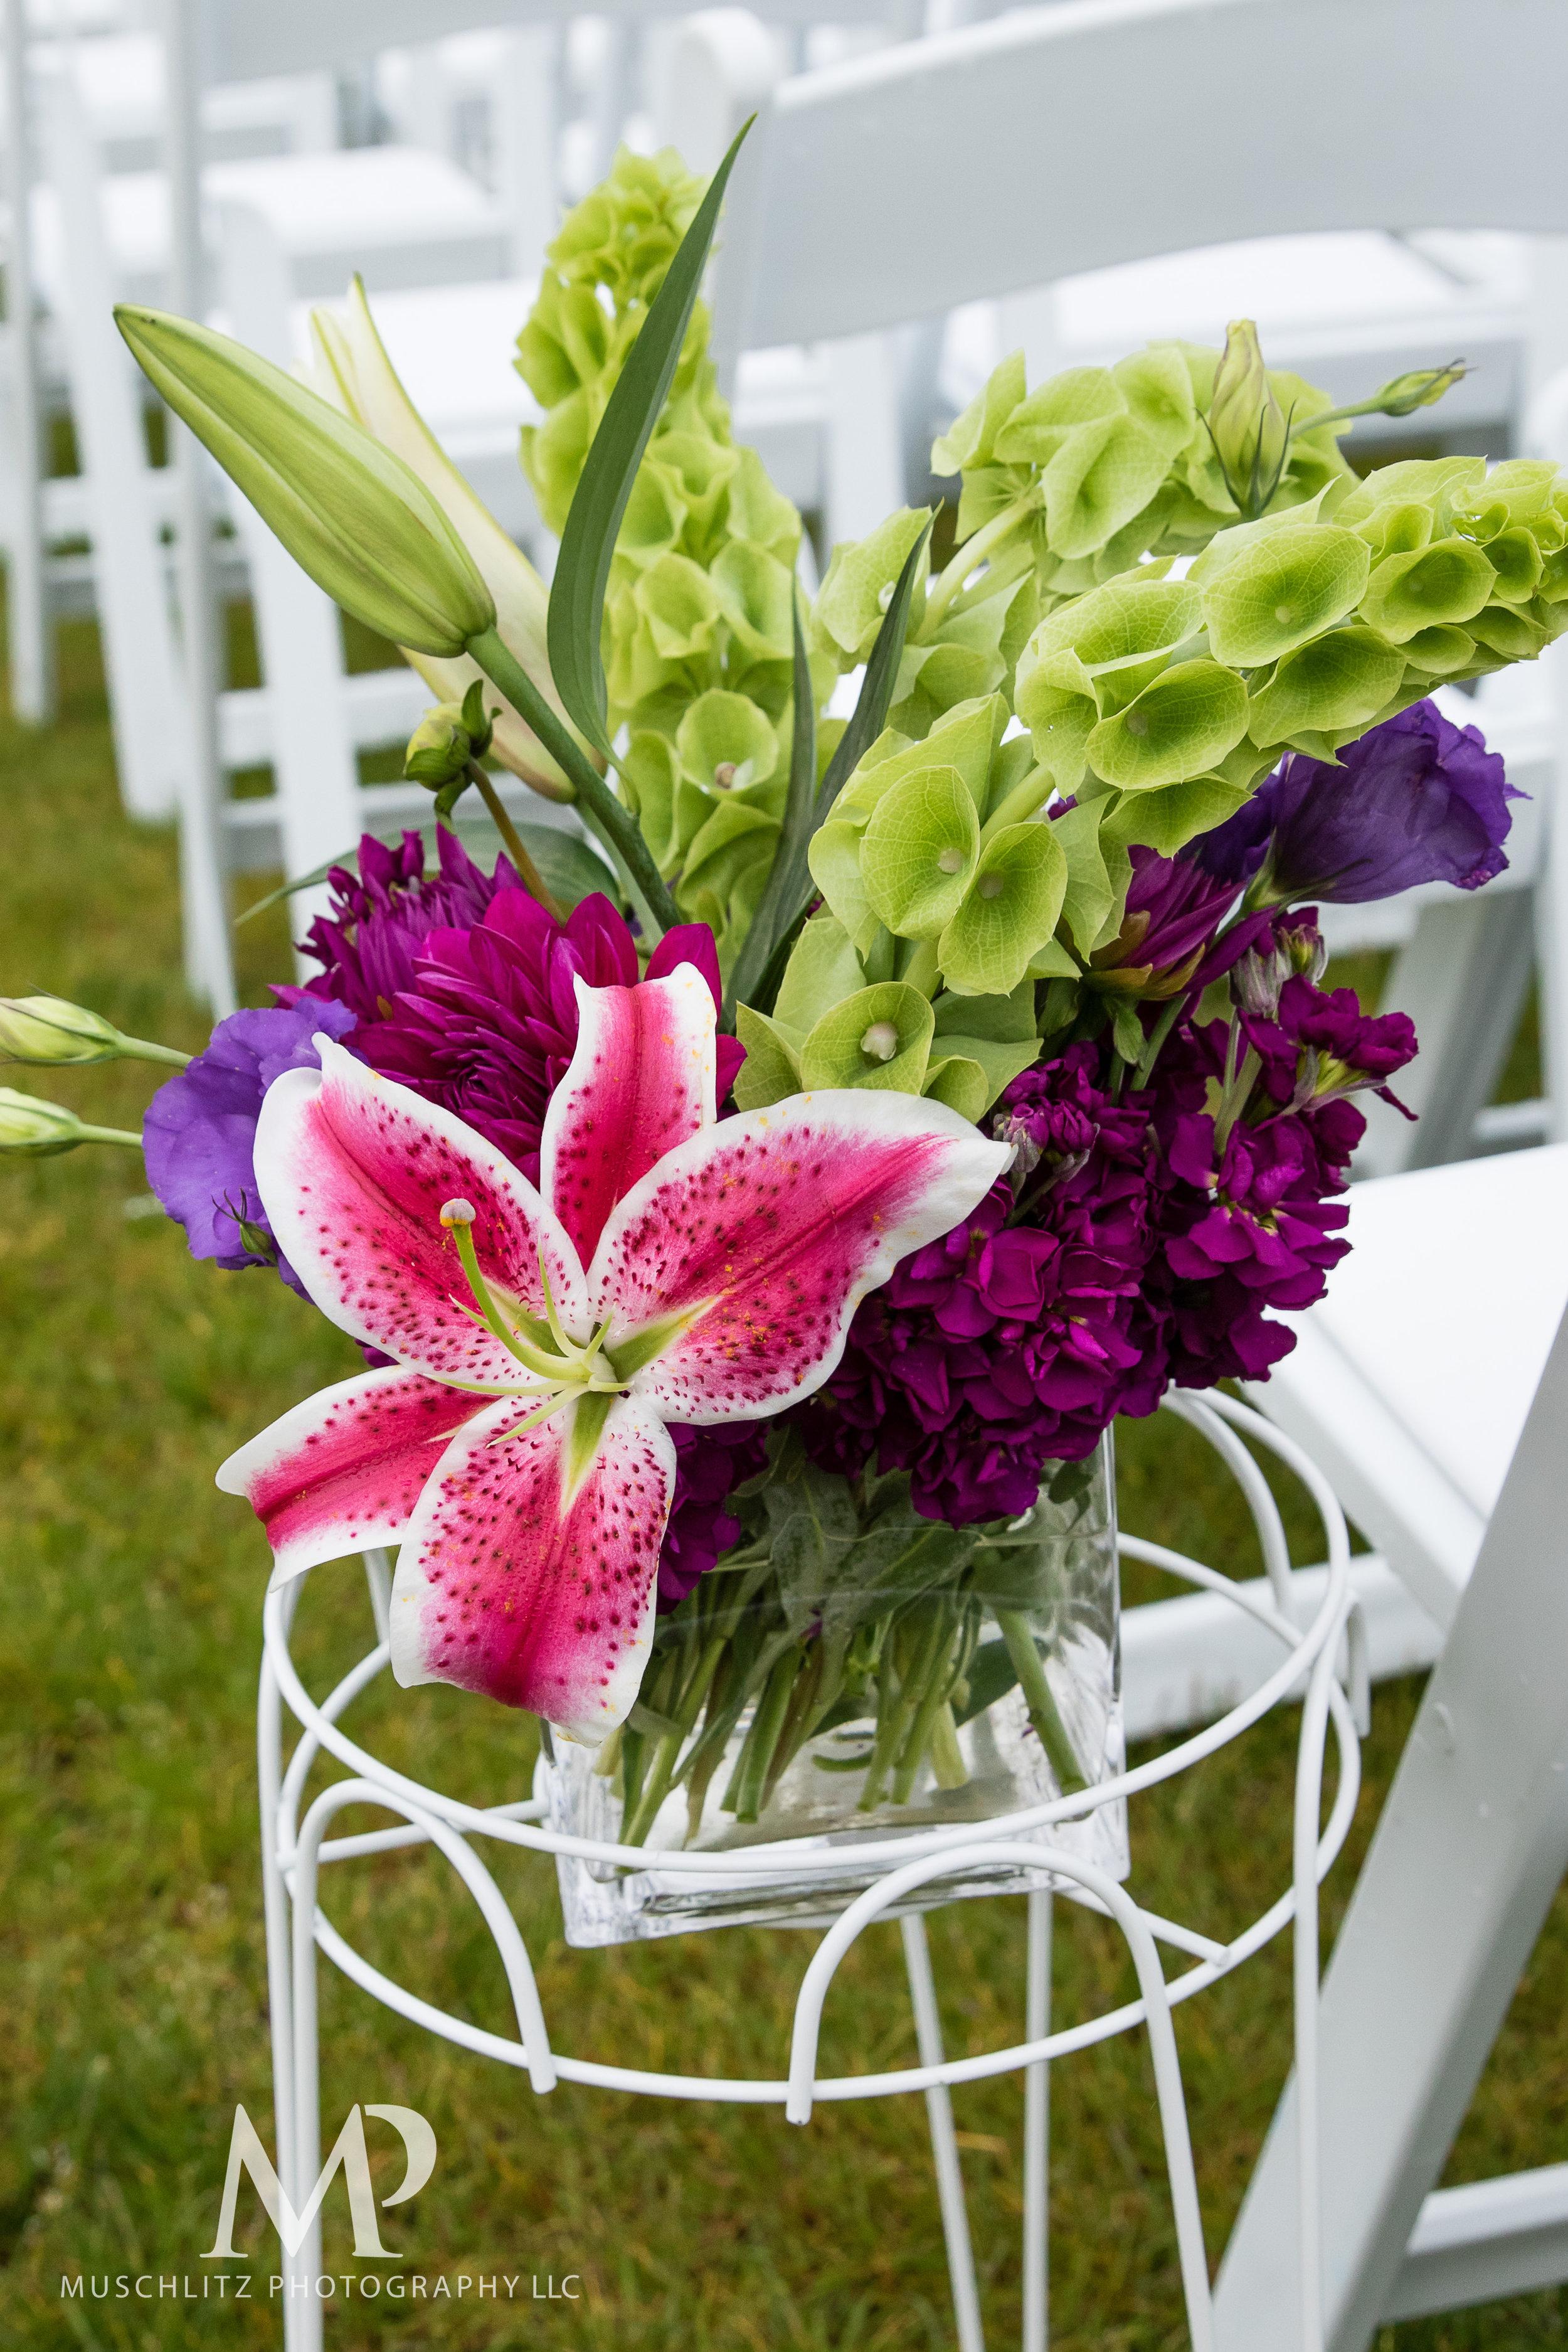 club-at-corazon-wedding-ceremony-reception-columbus-dublin-ohio-ohio-university-theme-023.JPG